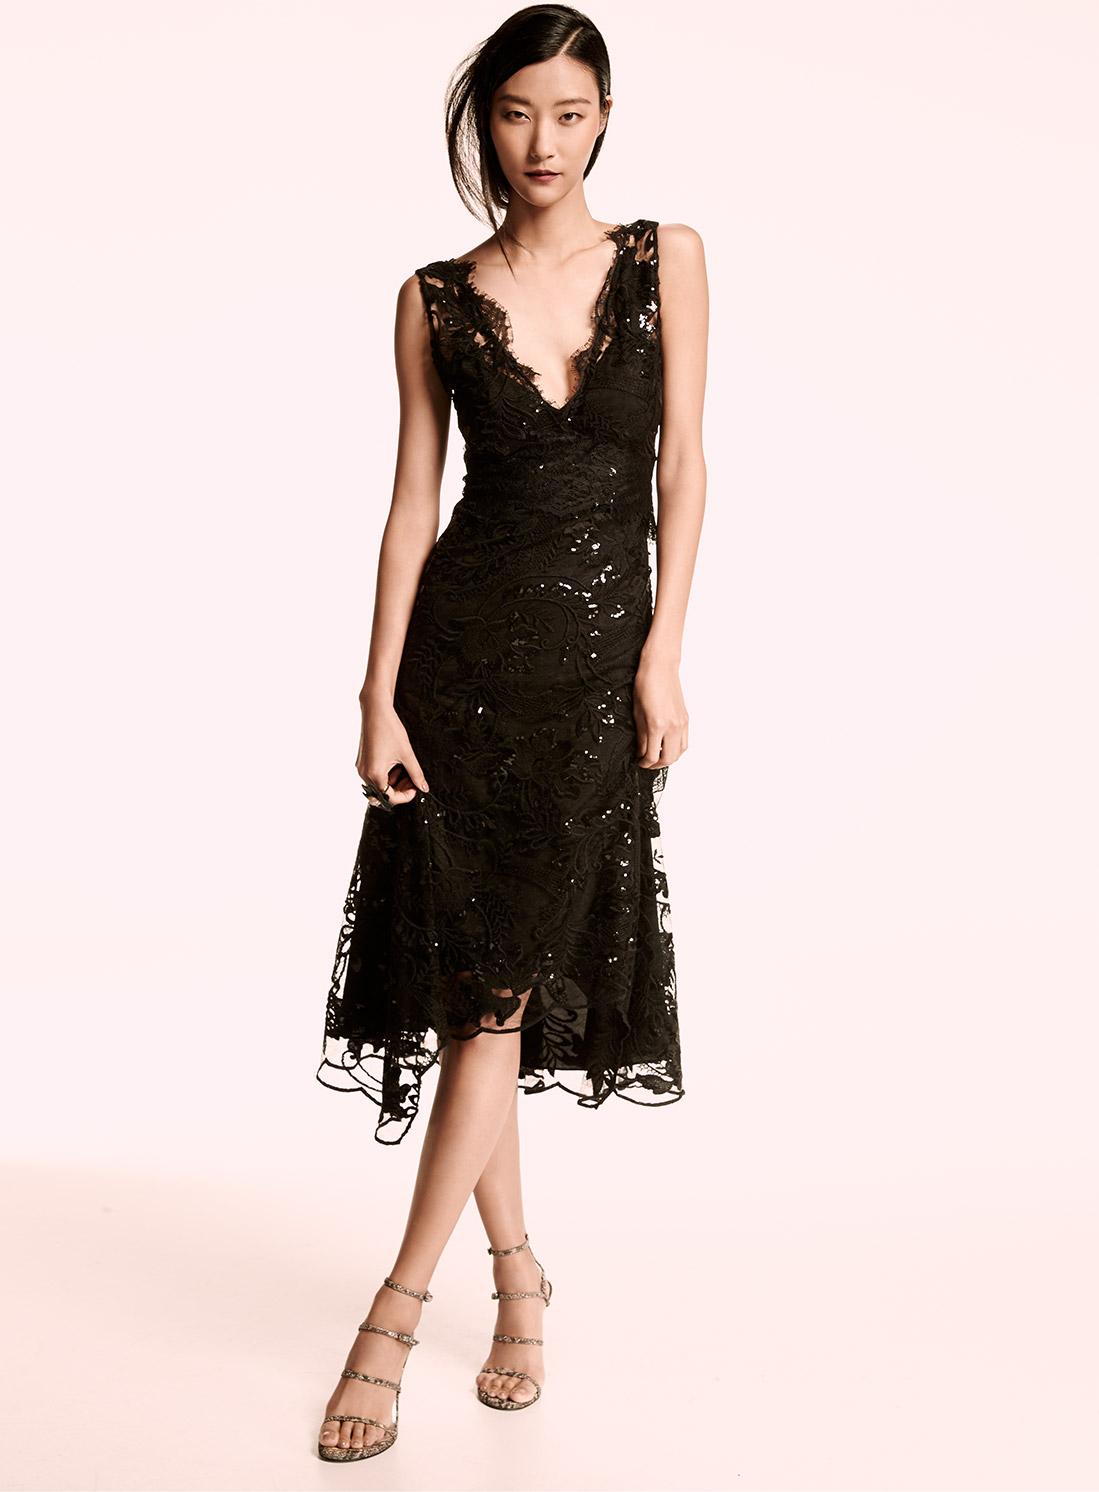 Black dress neiman marcus - Kobi Halperin Sleeveless Embellished Lace Midi Dress Black